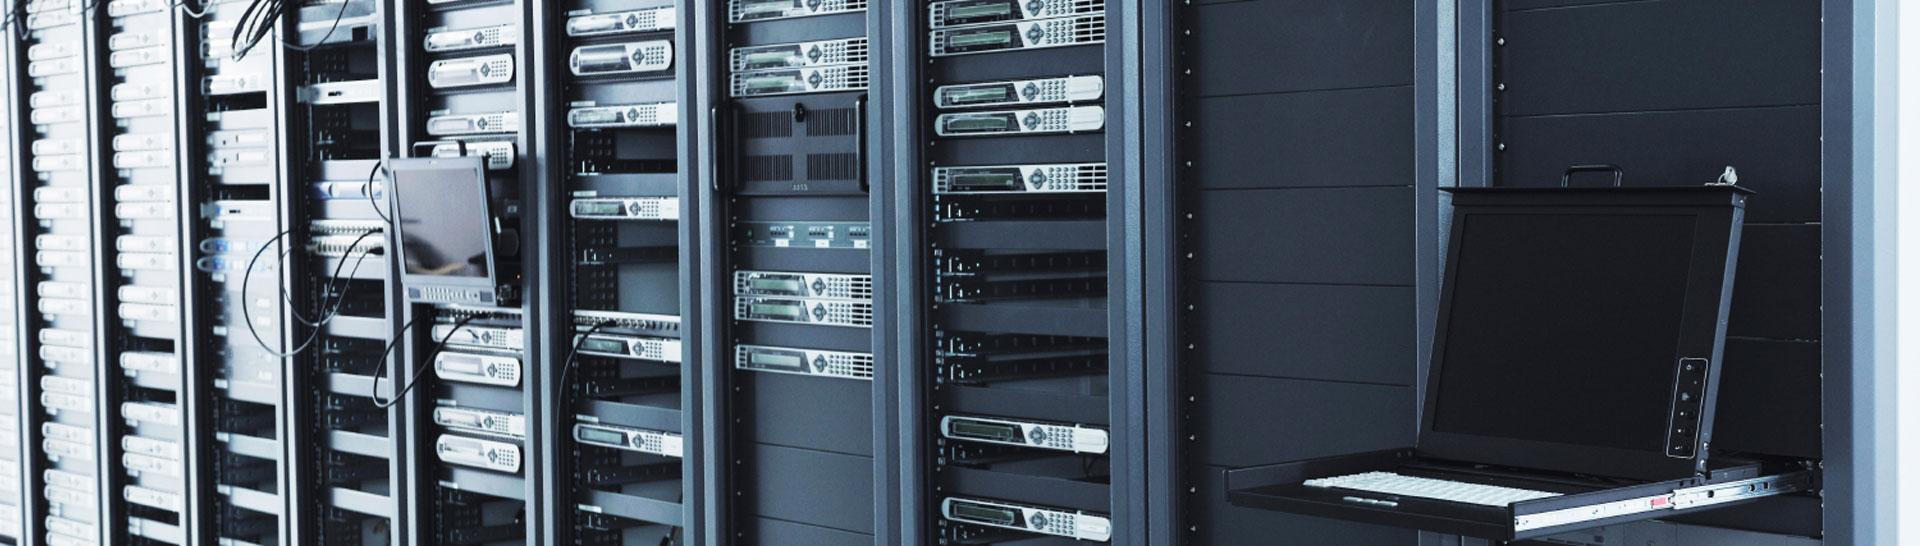 Network Troubleshooting